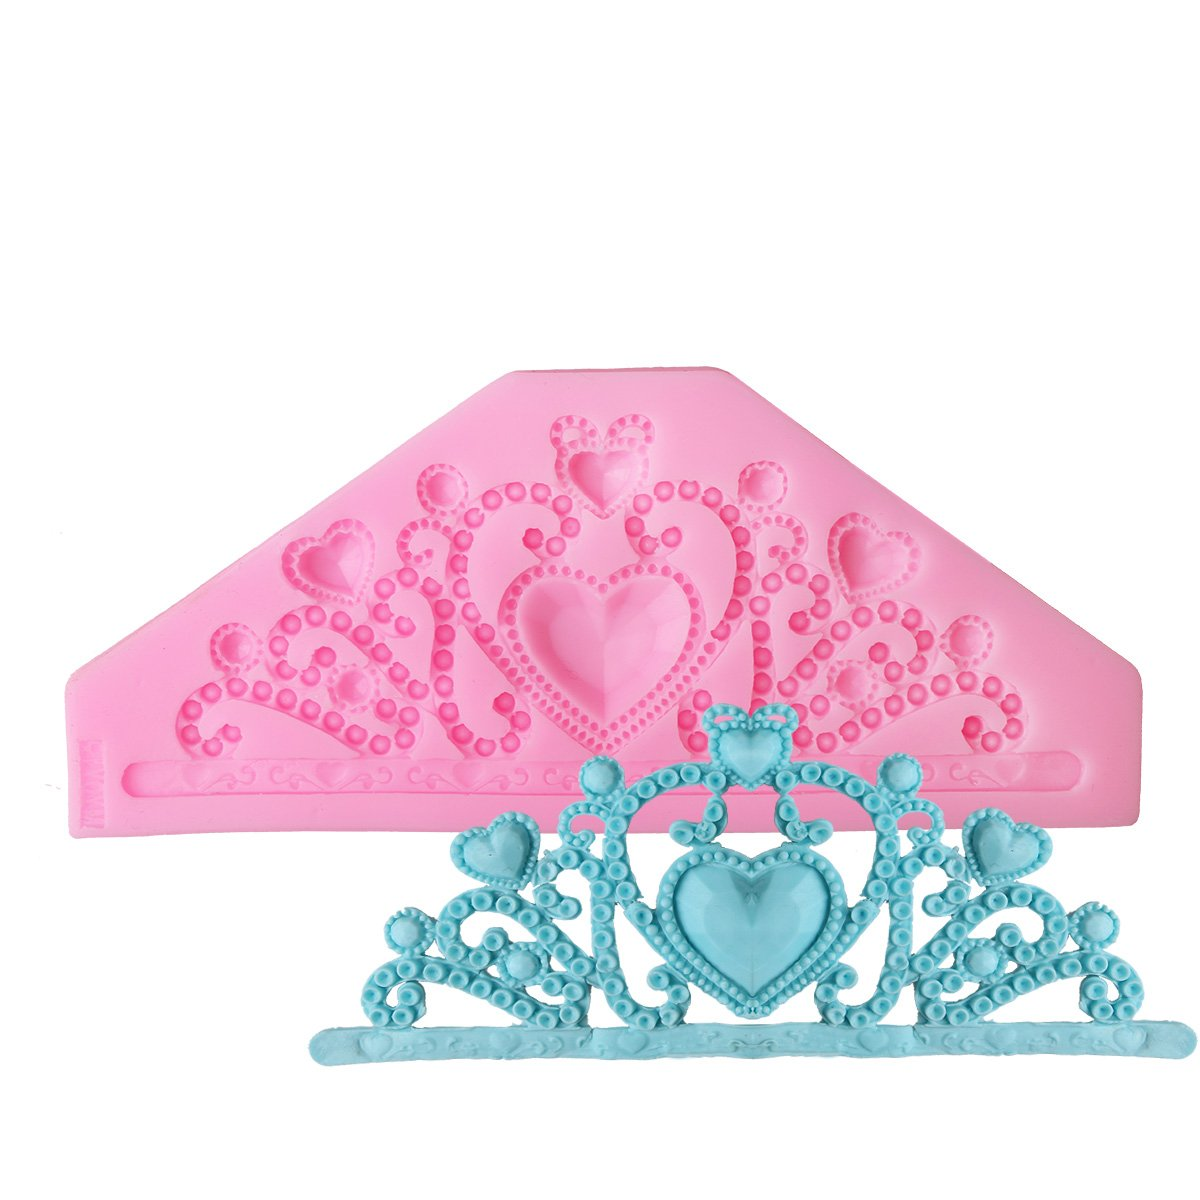 Deldige Big Gum Paste Moulds Queen Crown Cake Cookie Sweet Decorating Molds Pink Lady Girl Use Pink Delidge C1606